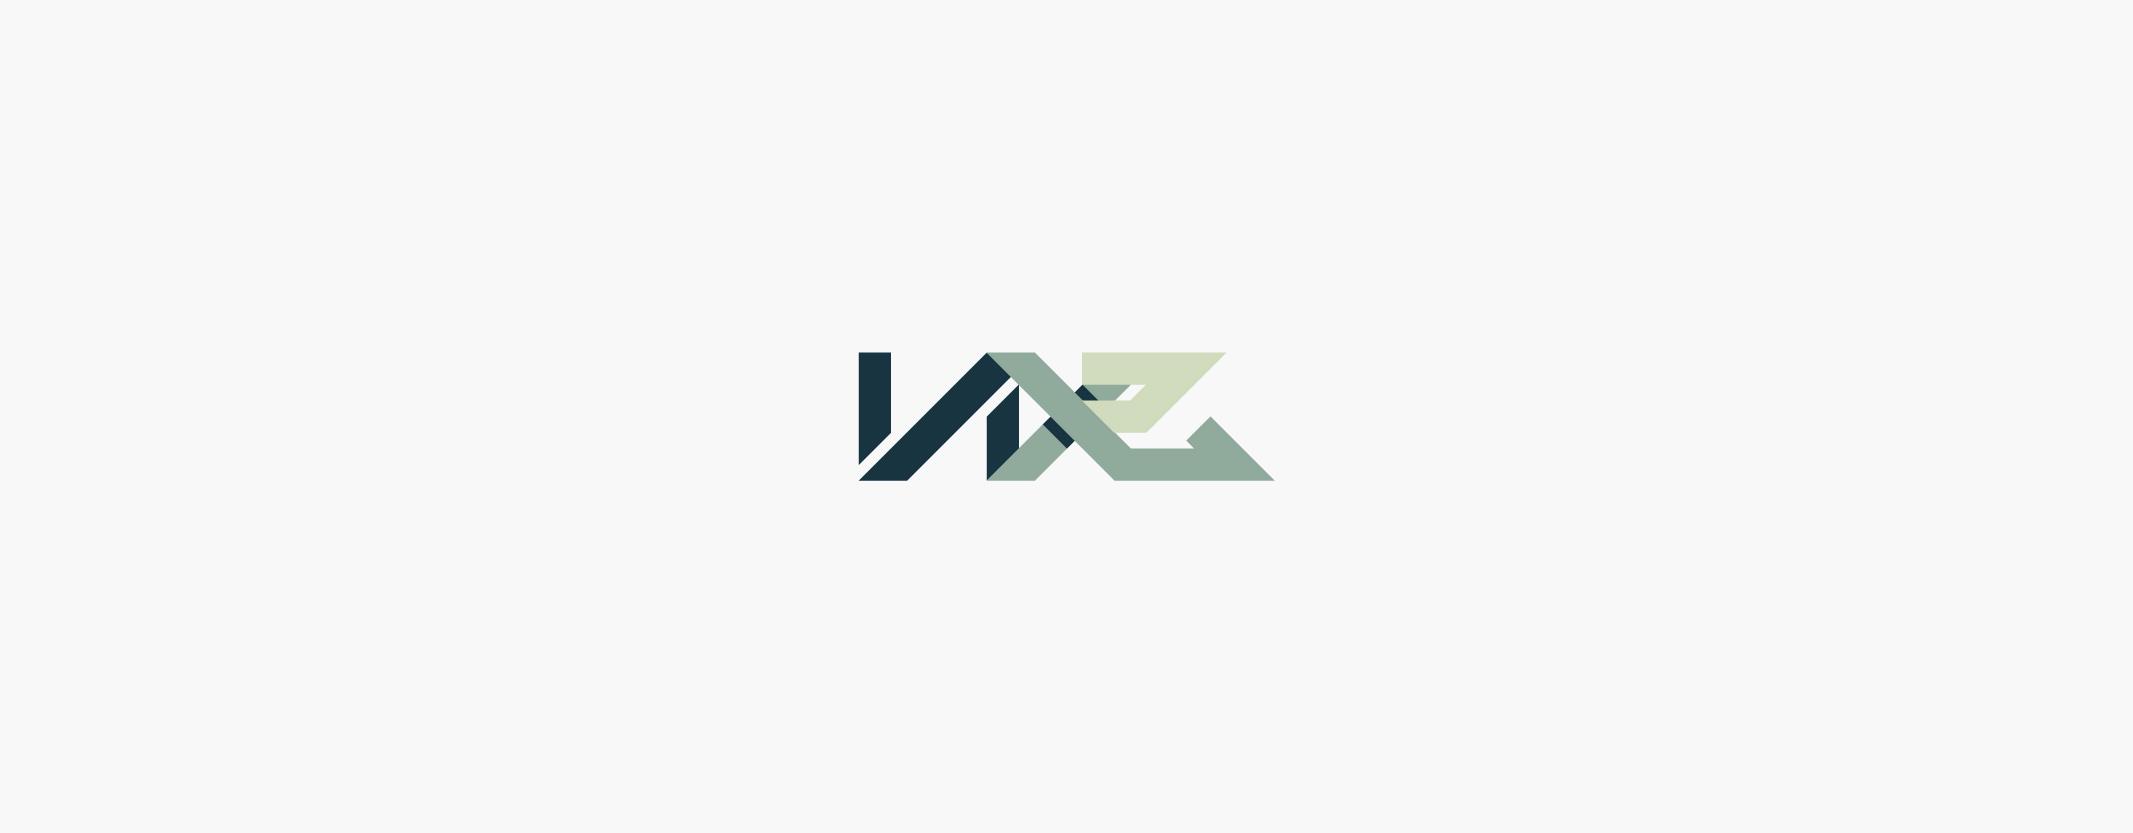 64_logos_wxz